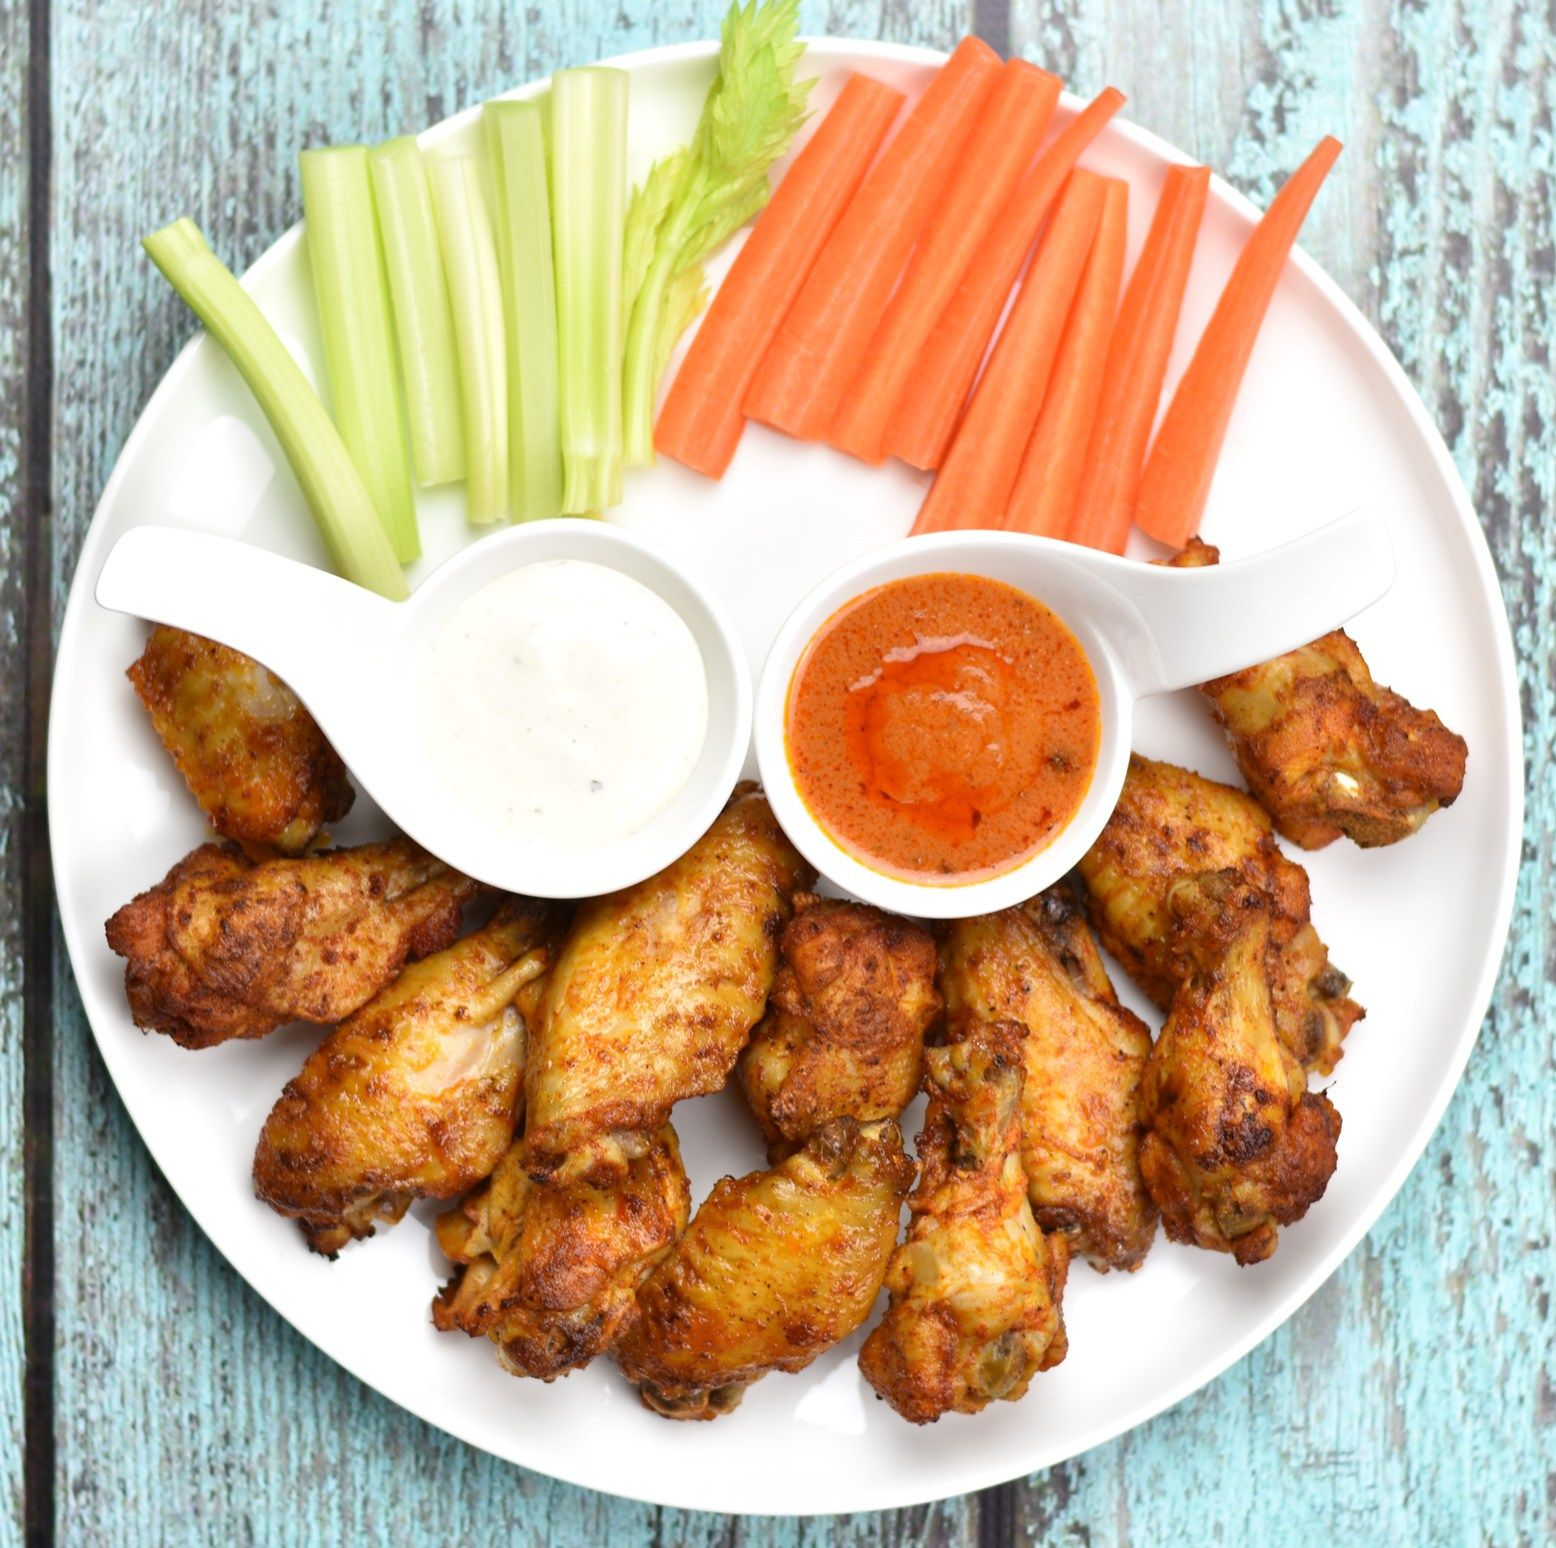 Buffalo Chicken Wings: Instant Pot Vs. Oven